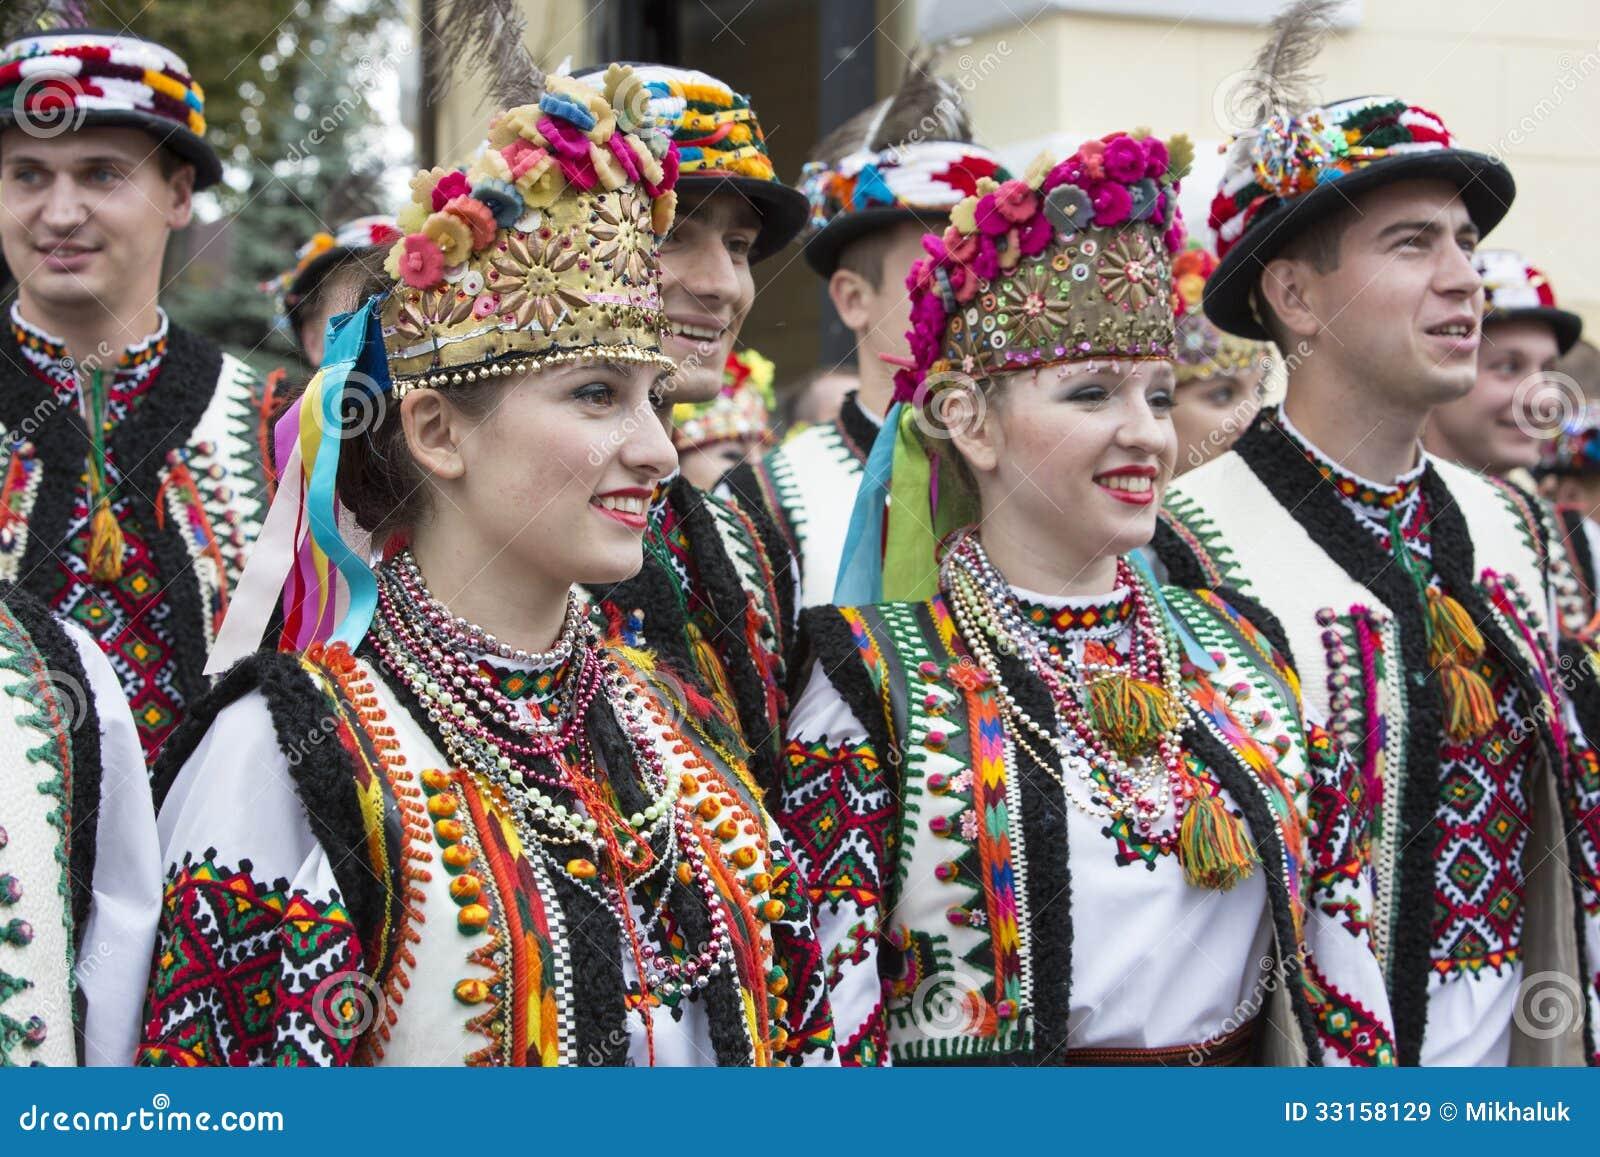 Celebration Of Ukrainian Women 94